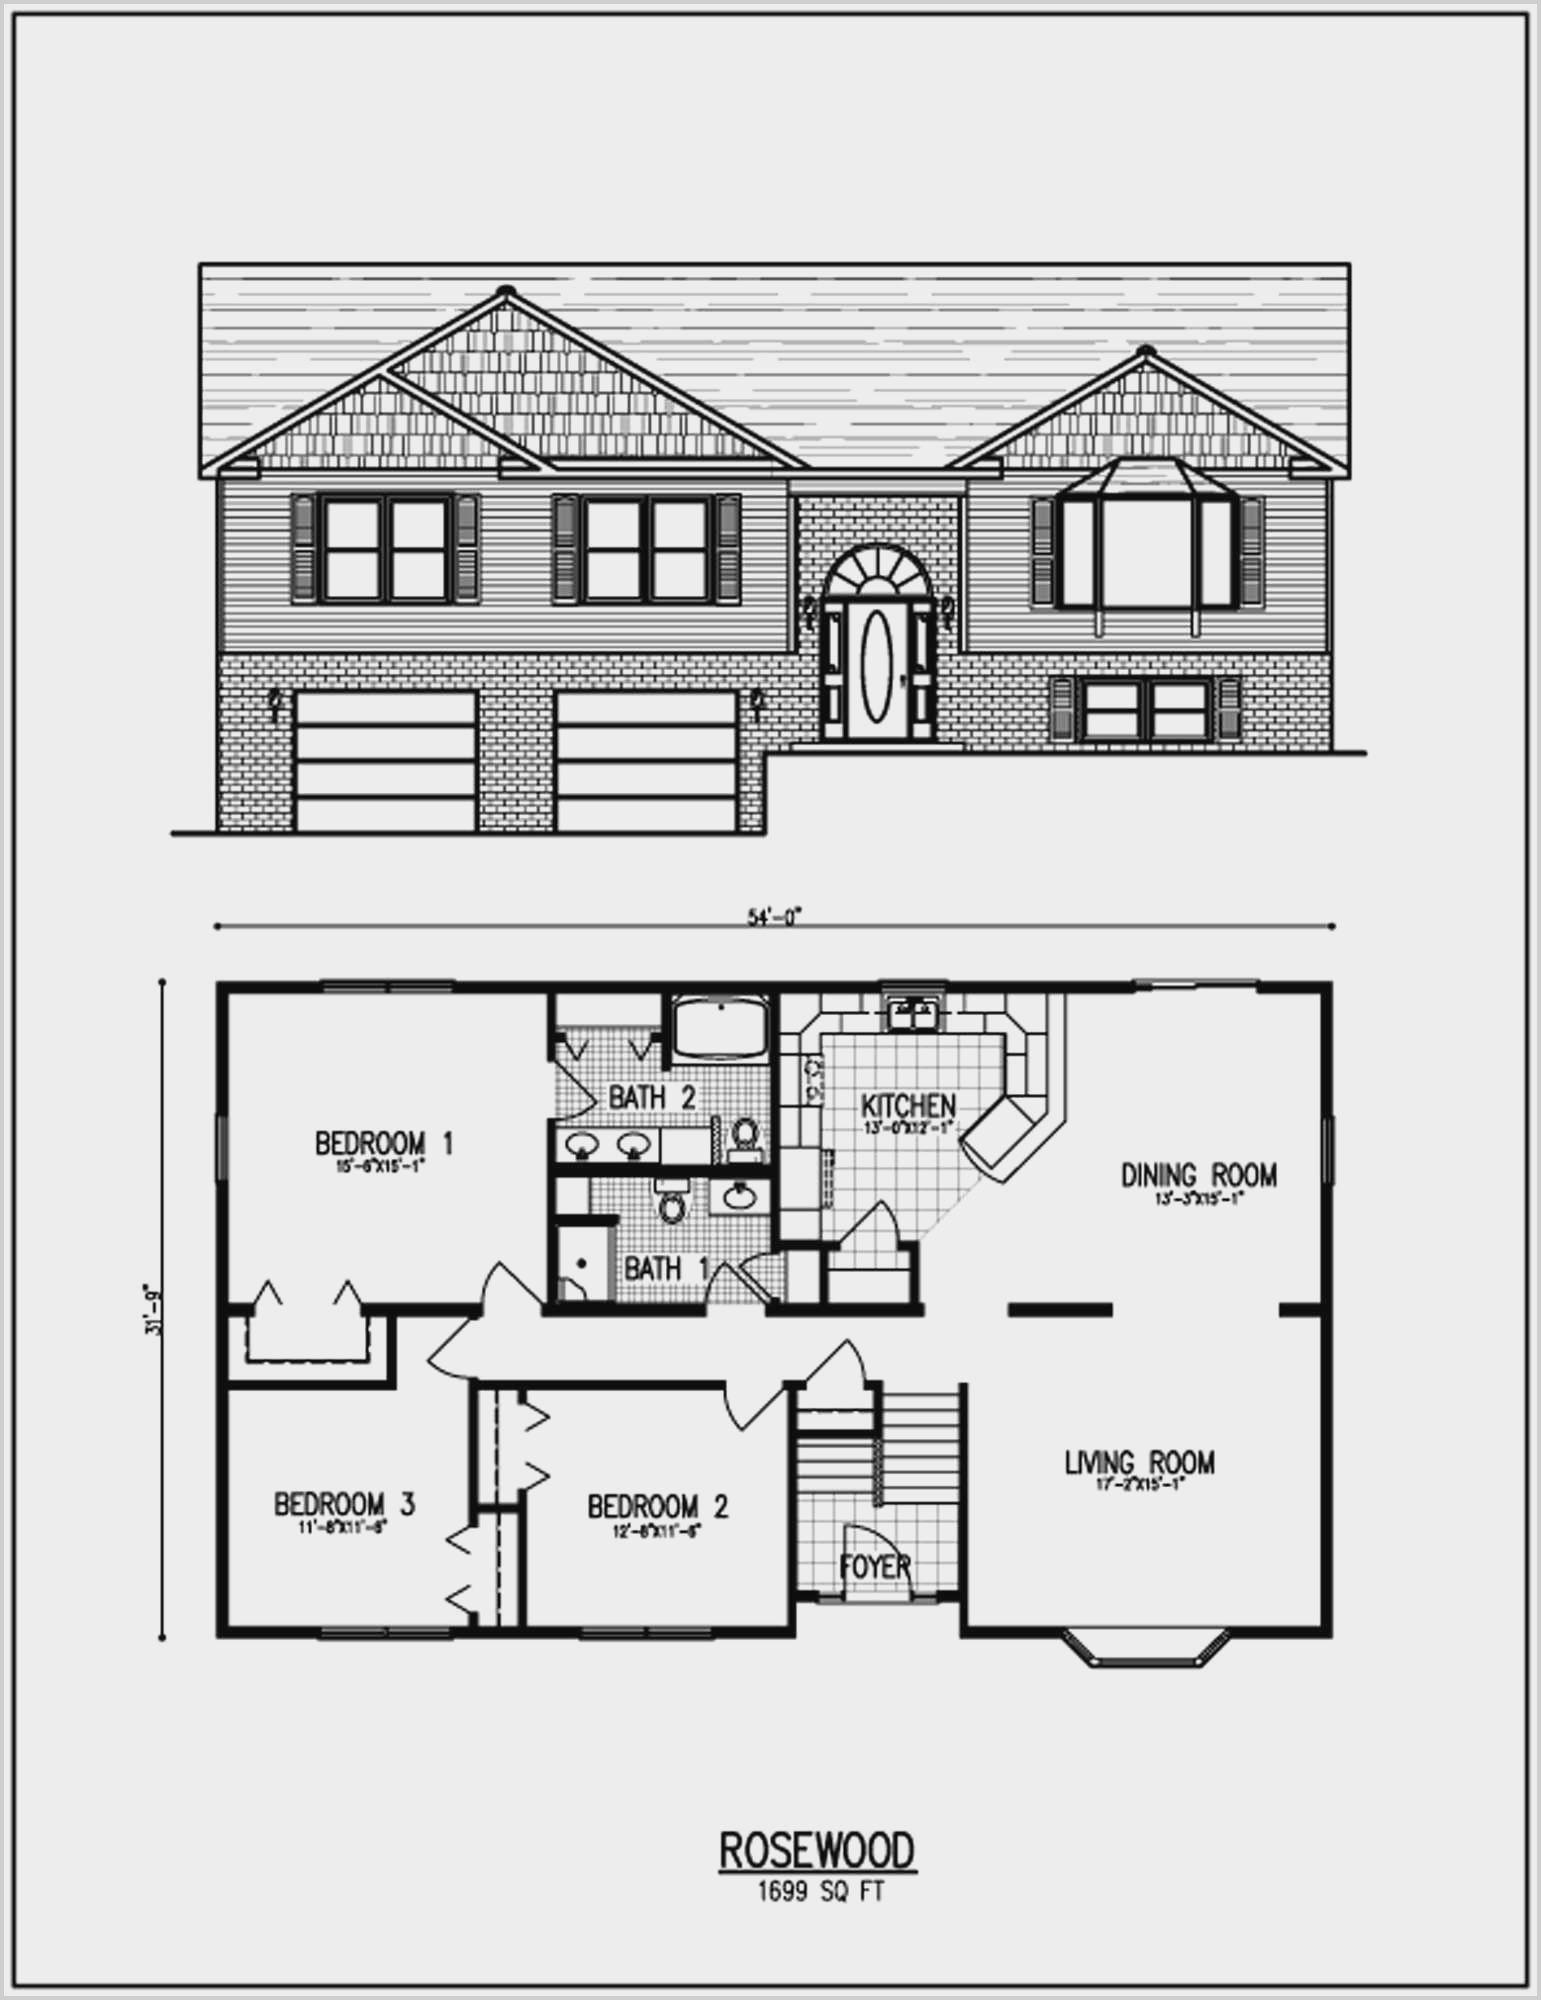 Raised Ranch Living Room Designs In 2020 Floor Plans Ranch Ranch House Plans Ranch House